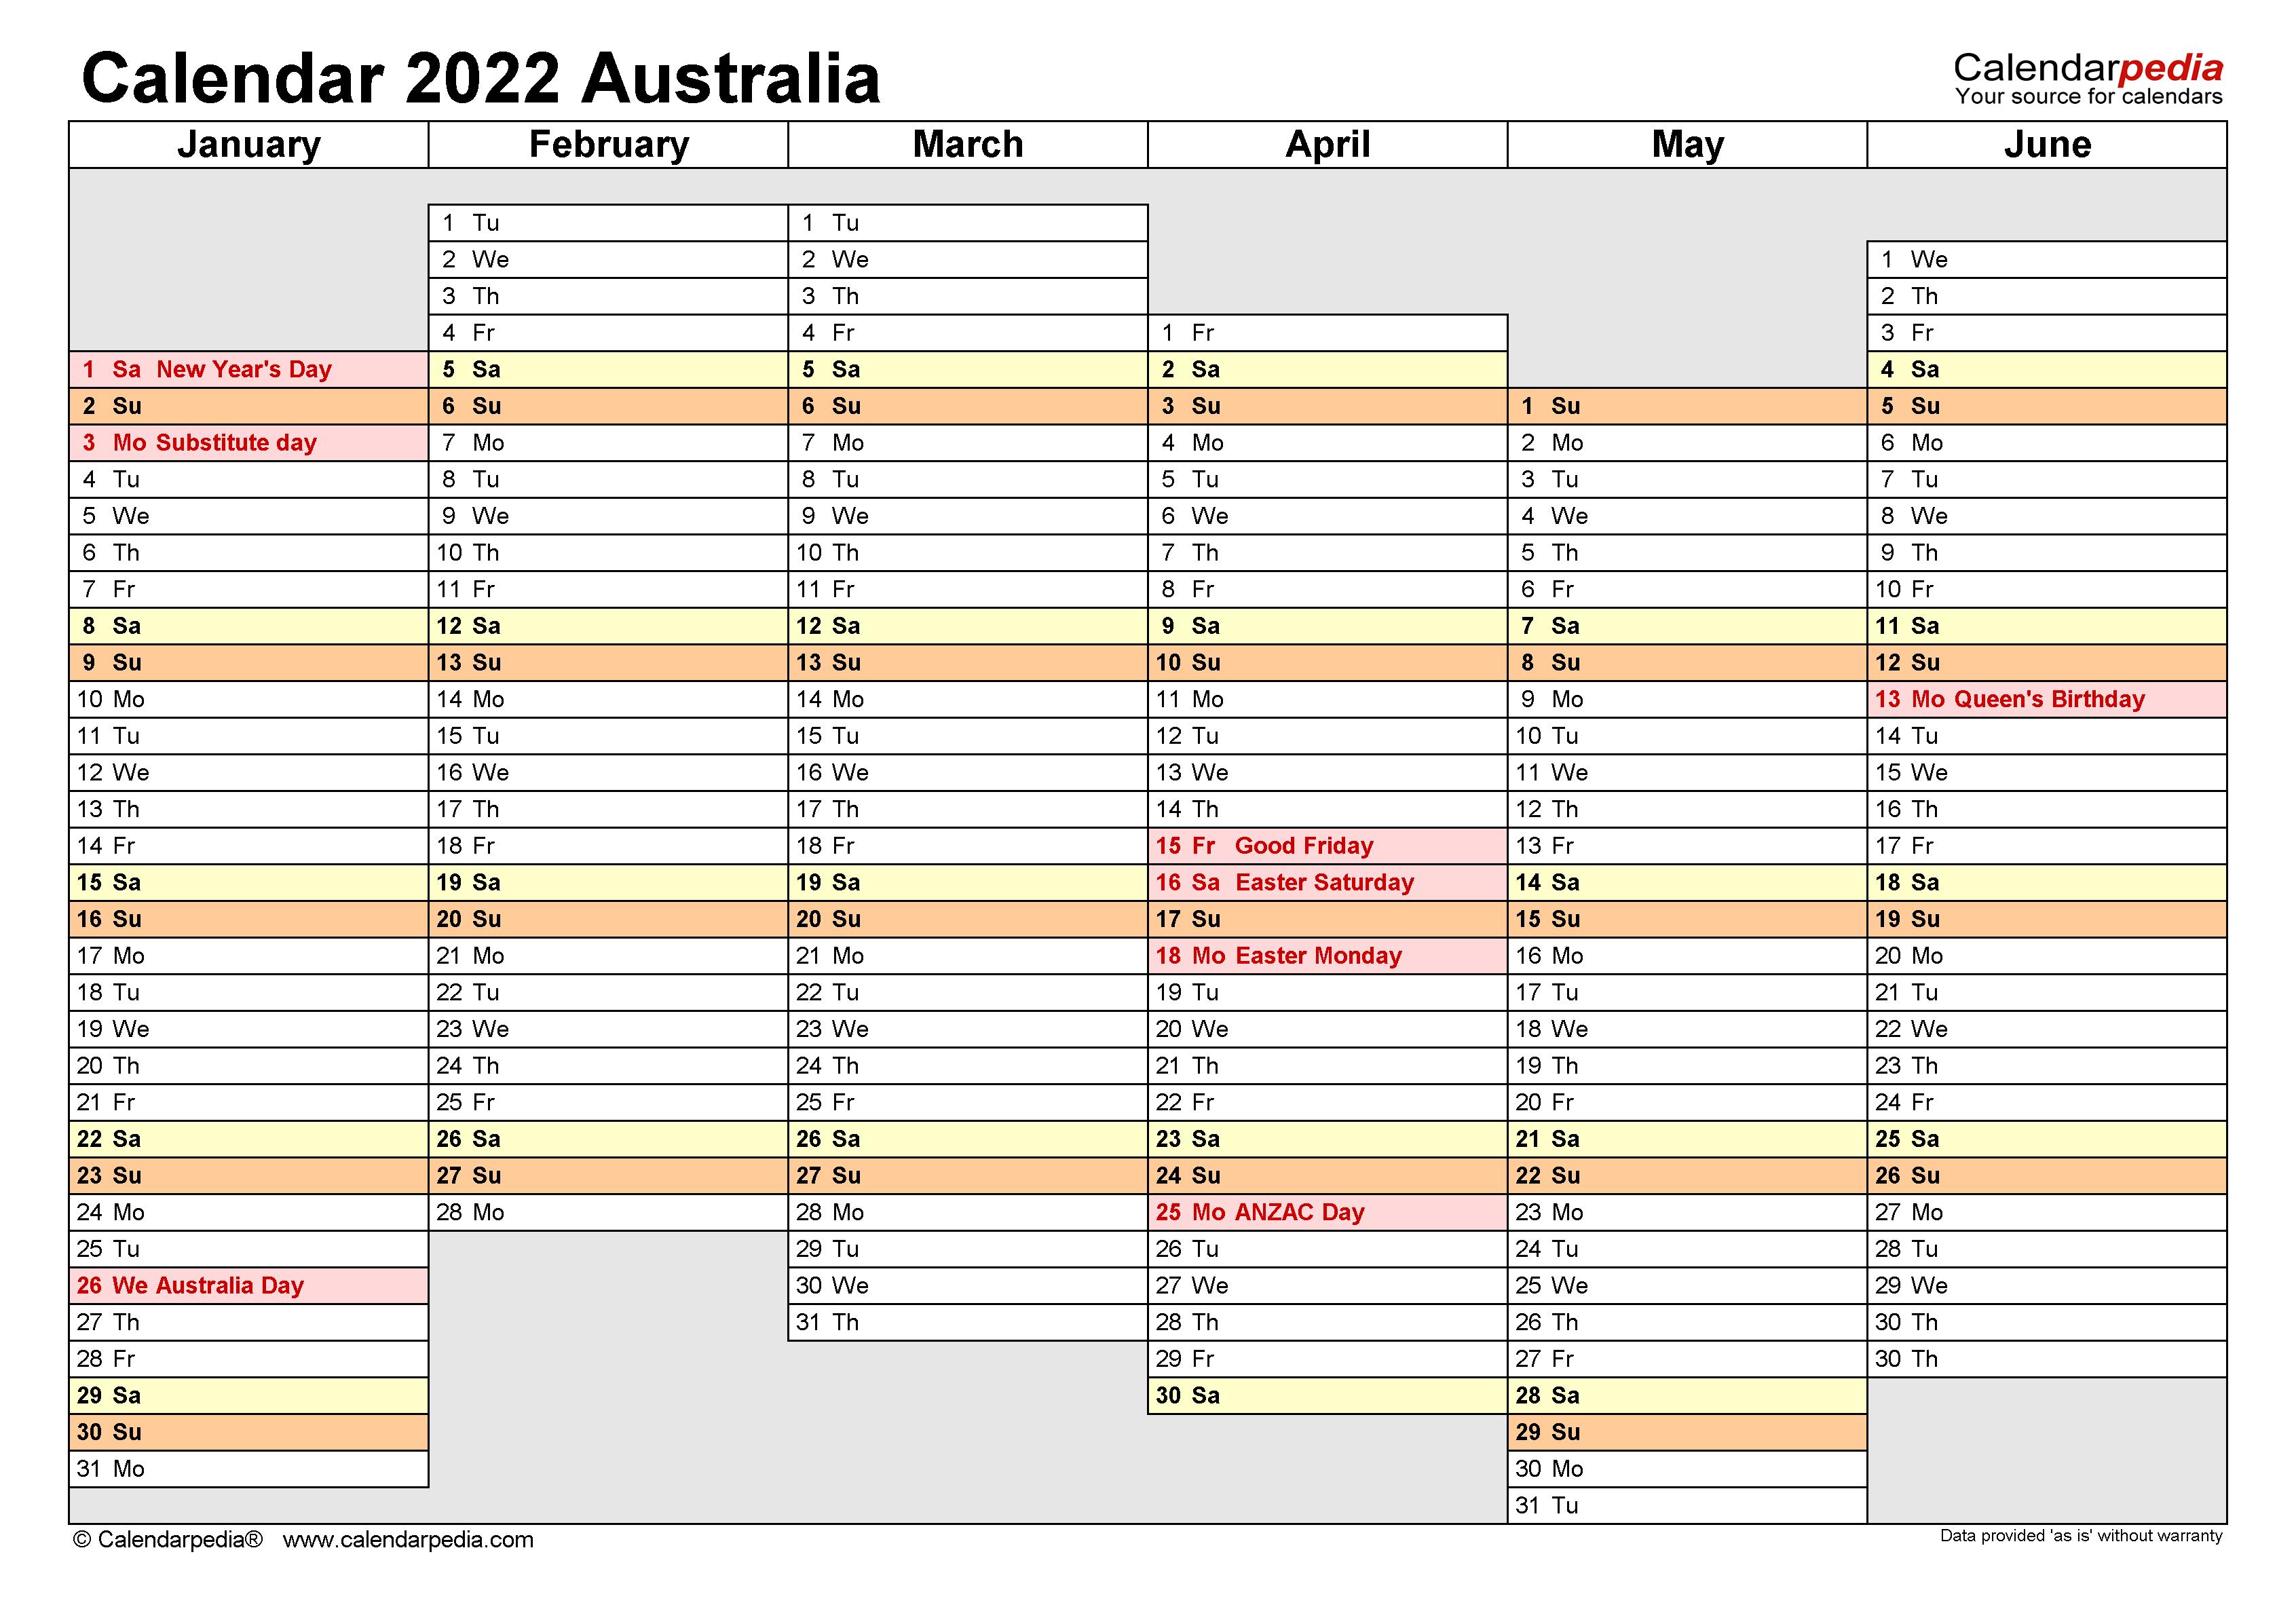 Australia Calendar 2022 - Free Printable Excel templates